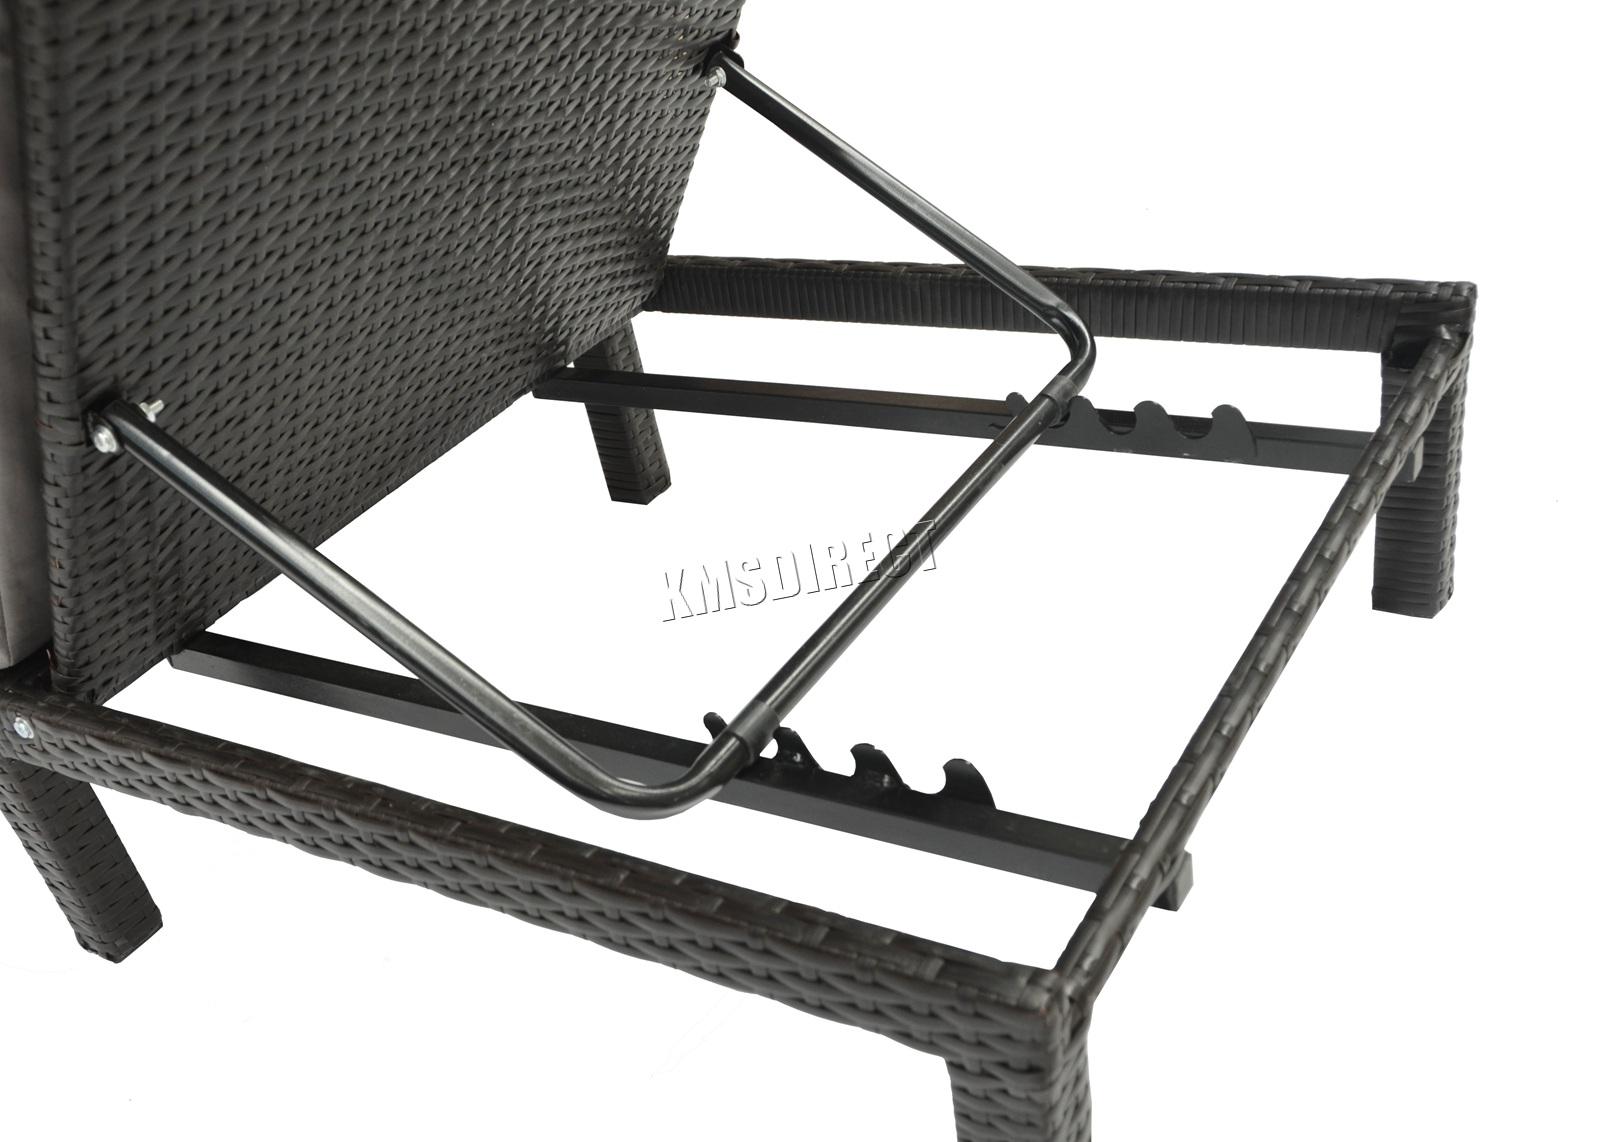 BIRCHTREE Rattan Day Chair Recliner Sun Bed Lounger Outdoor Garden Patio SRL02